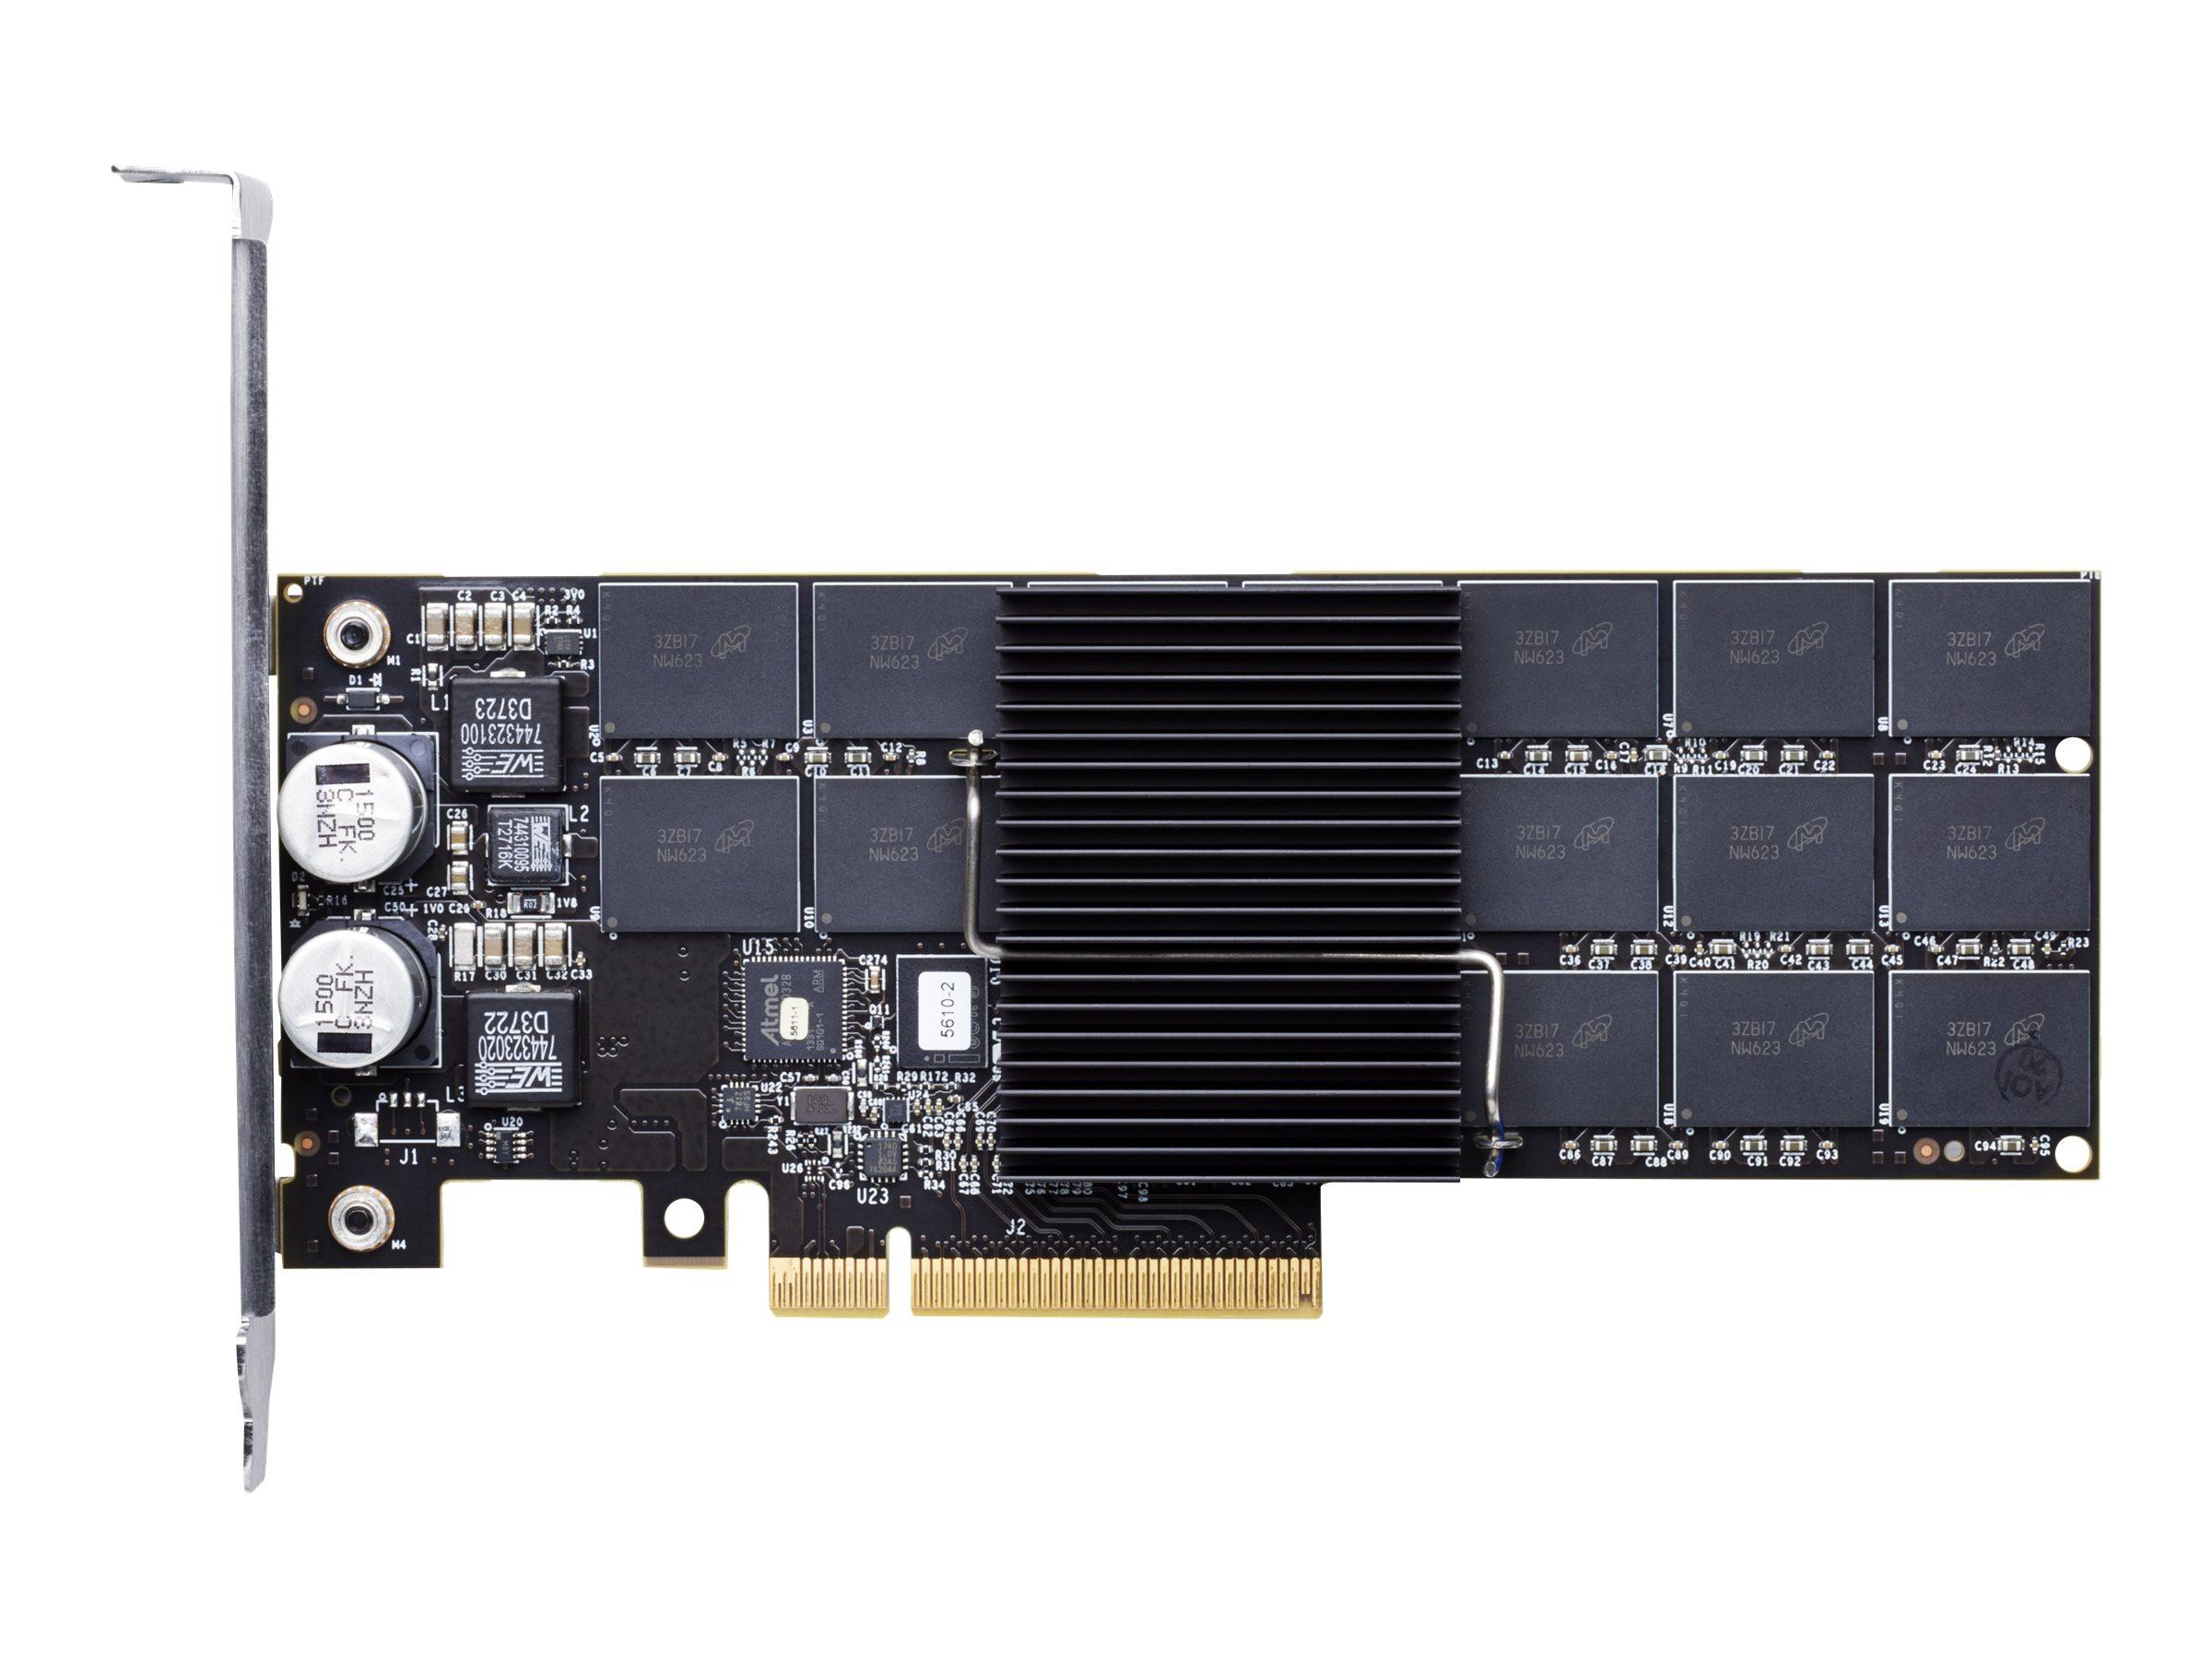 HP 365GB MLC G2 PCIe IO Accelerator (673642-B21) - REFURB